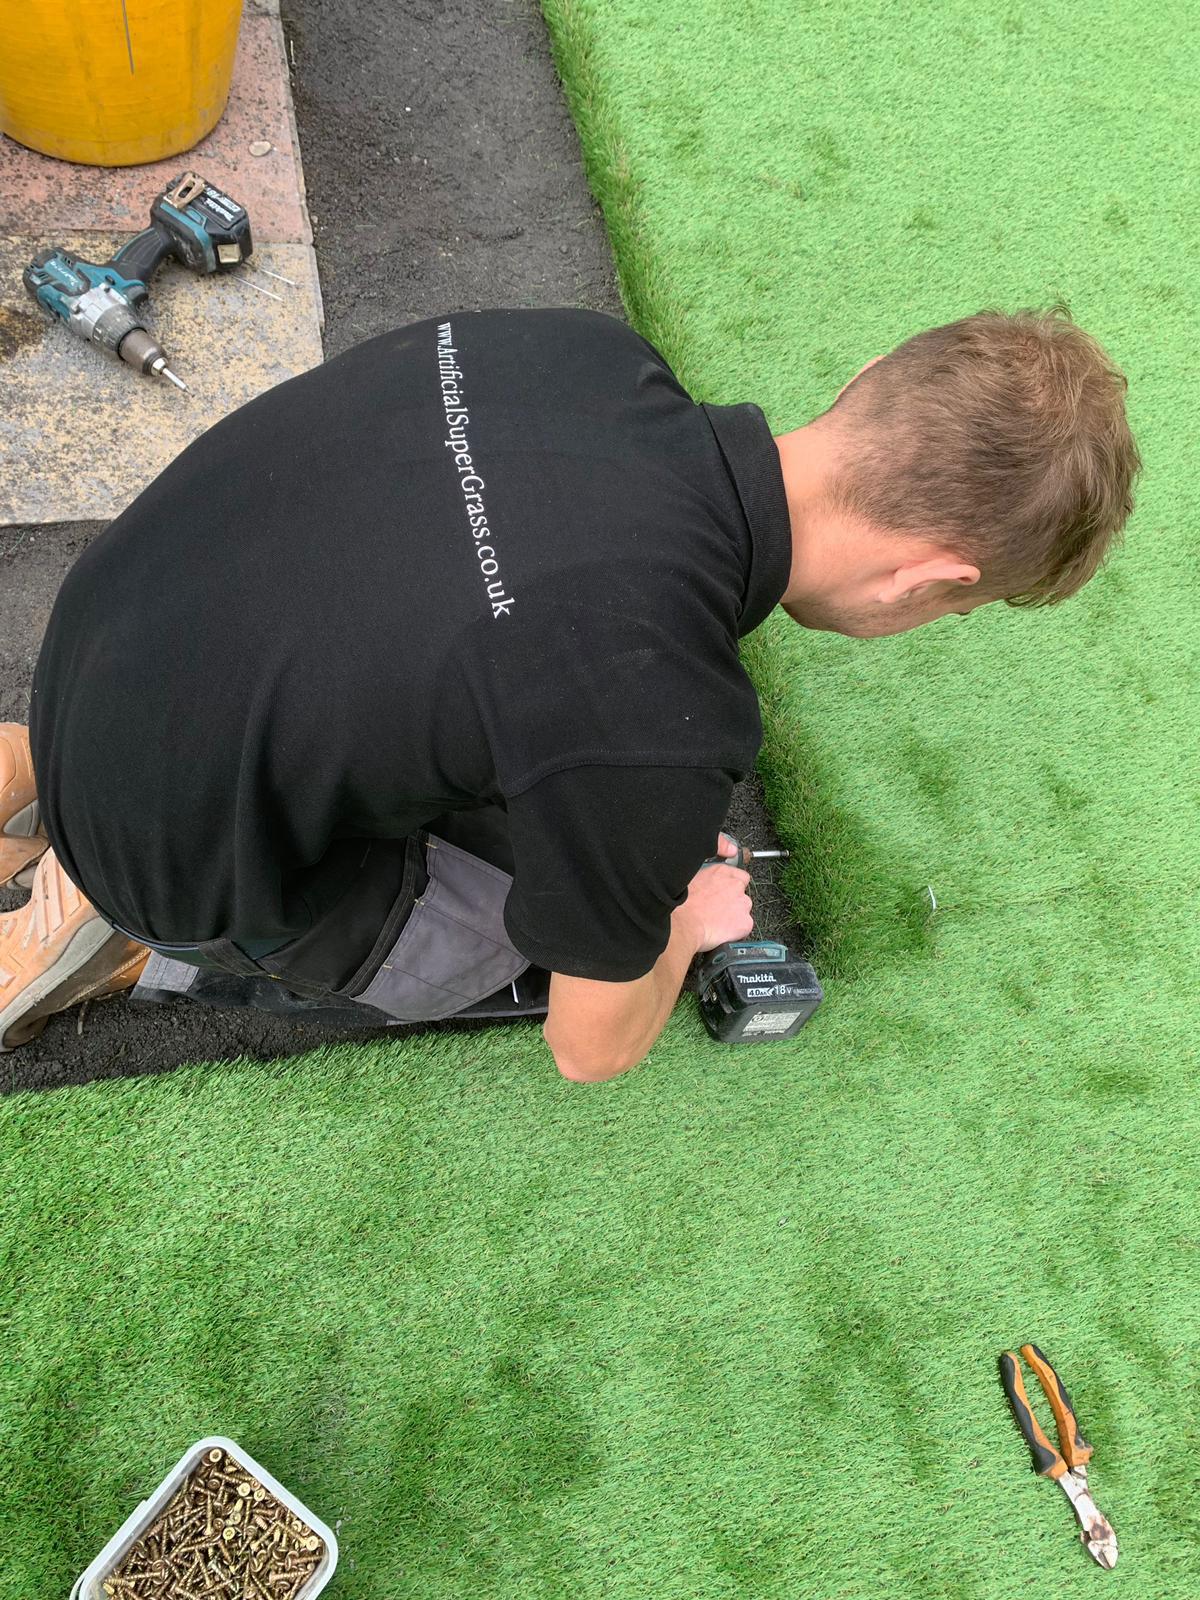 Fake Grass For Dogs Lytham St Annes Artificial Super Grass